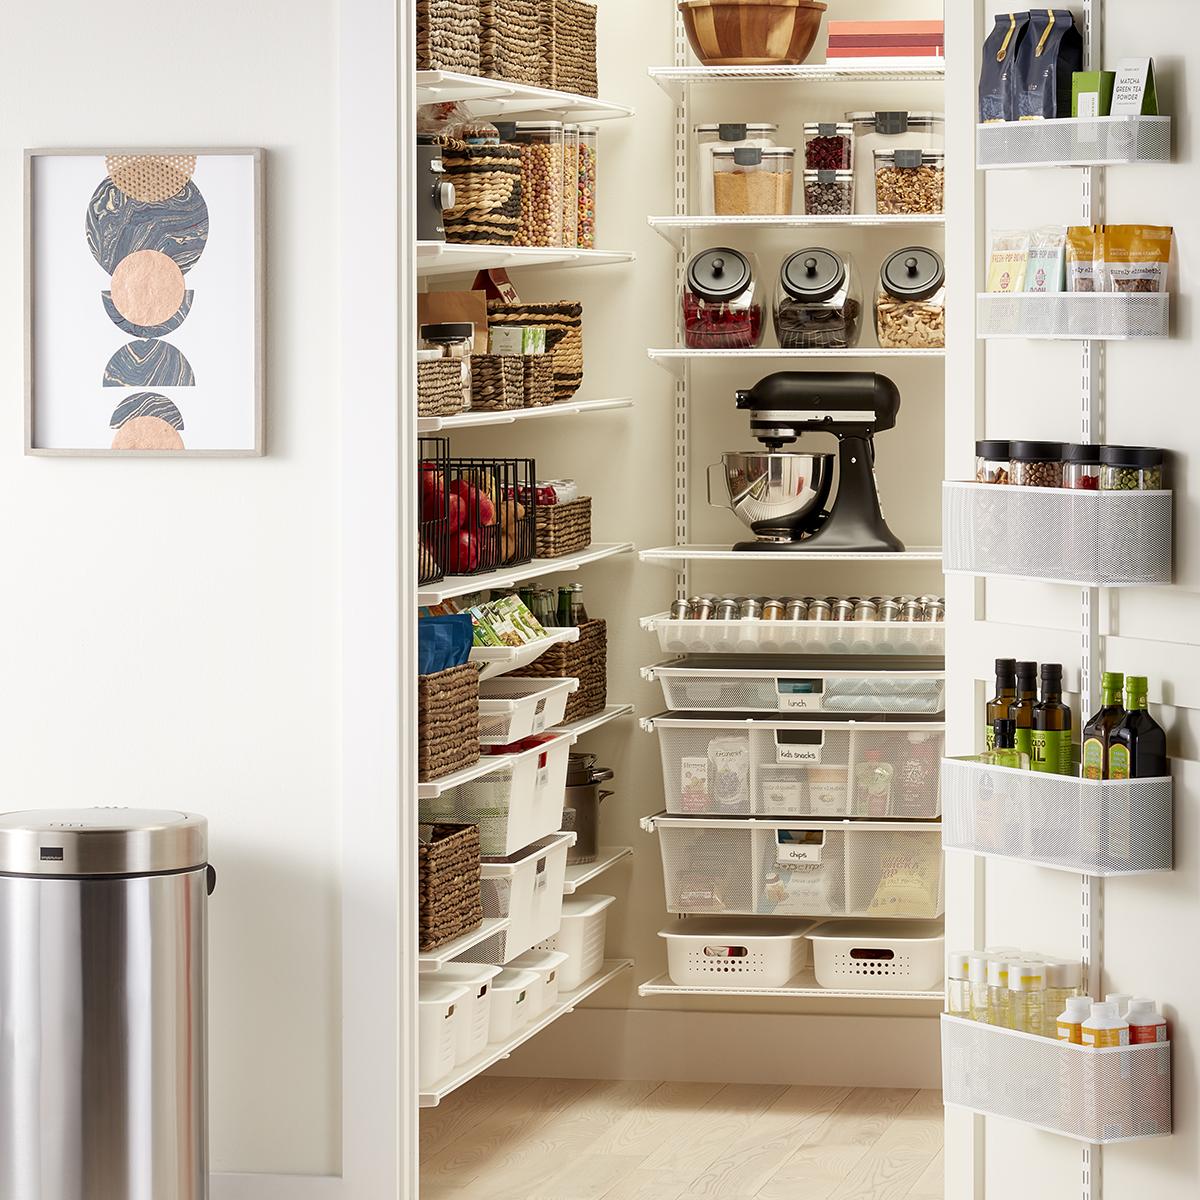 Elfa Classic White Walk-In Pantry with Door & Wall Rack